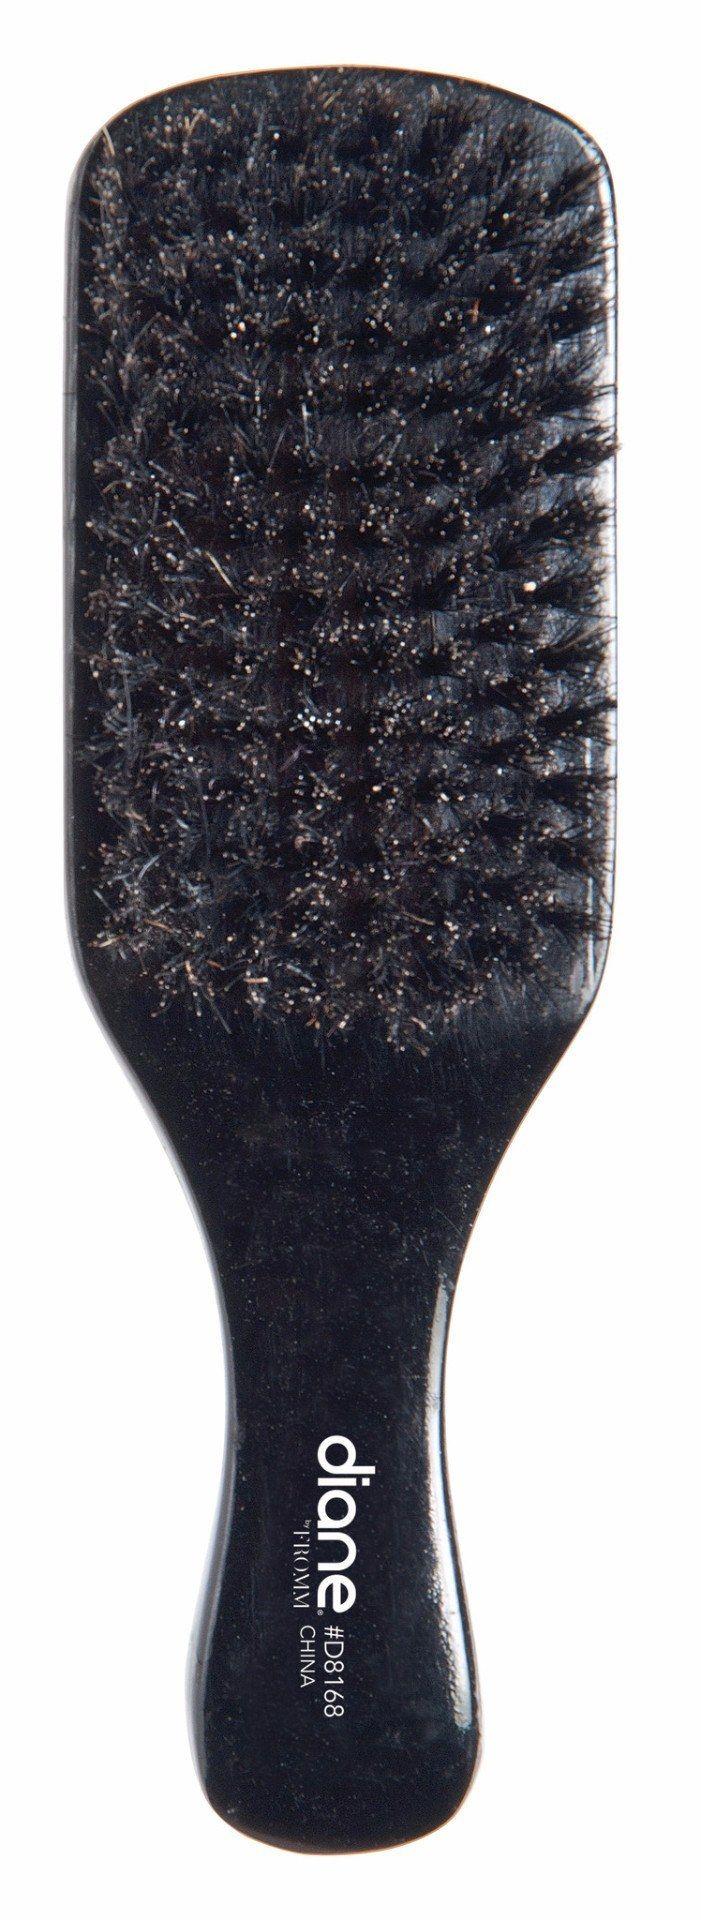 "- Club brush - 9 row 7"" - Wood - Color: Black"